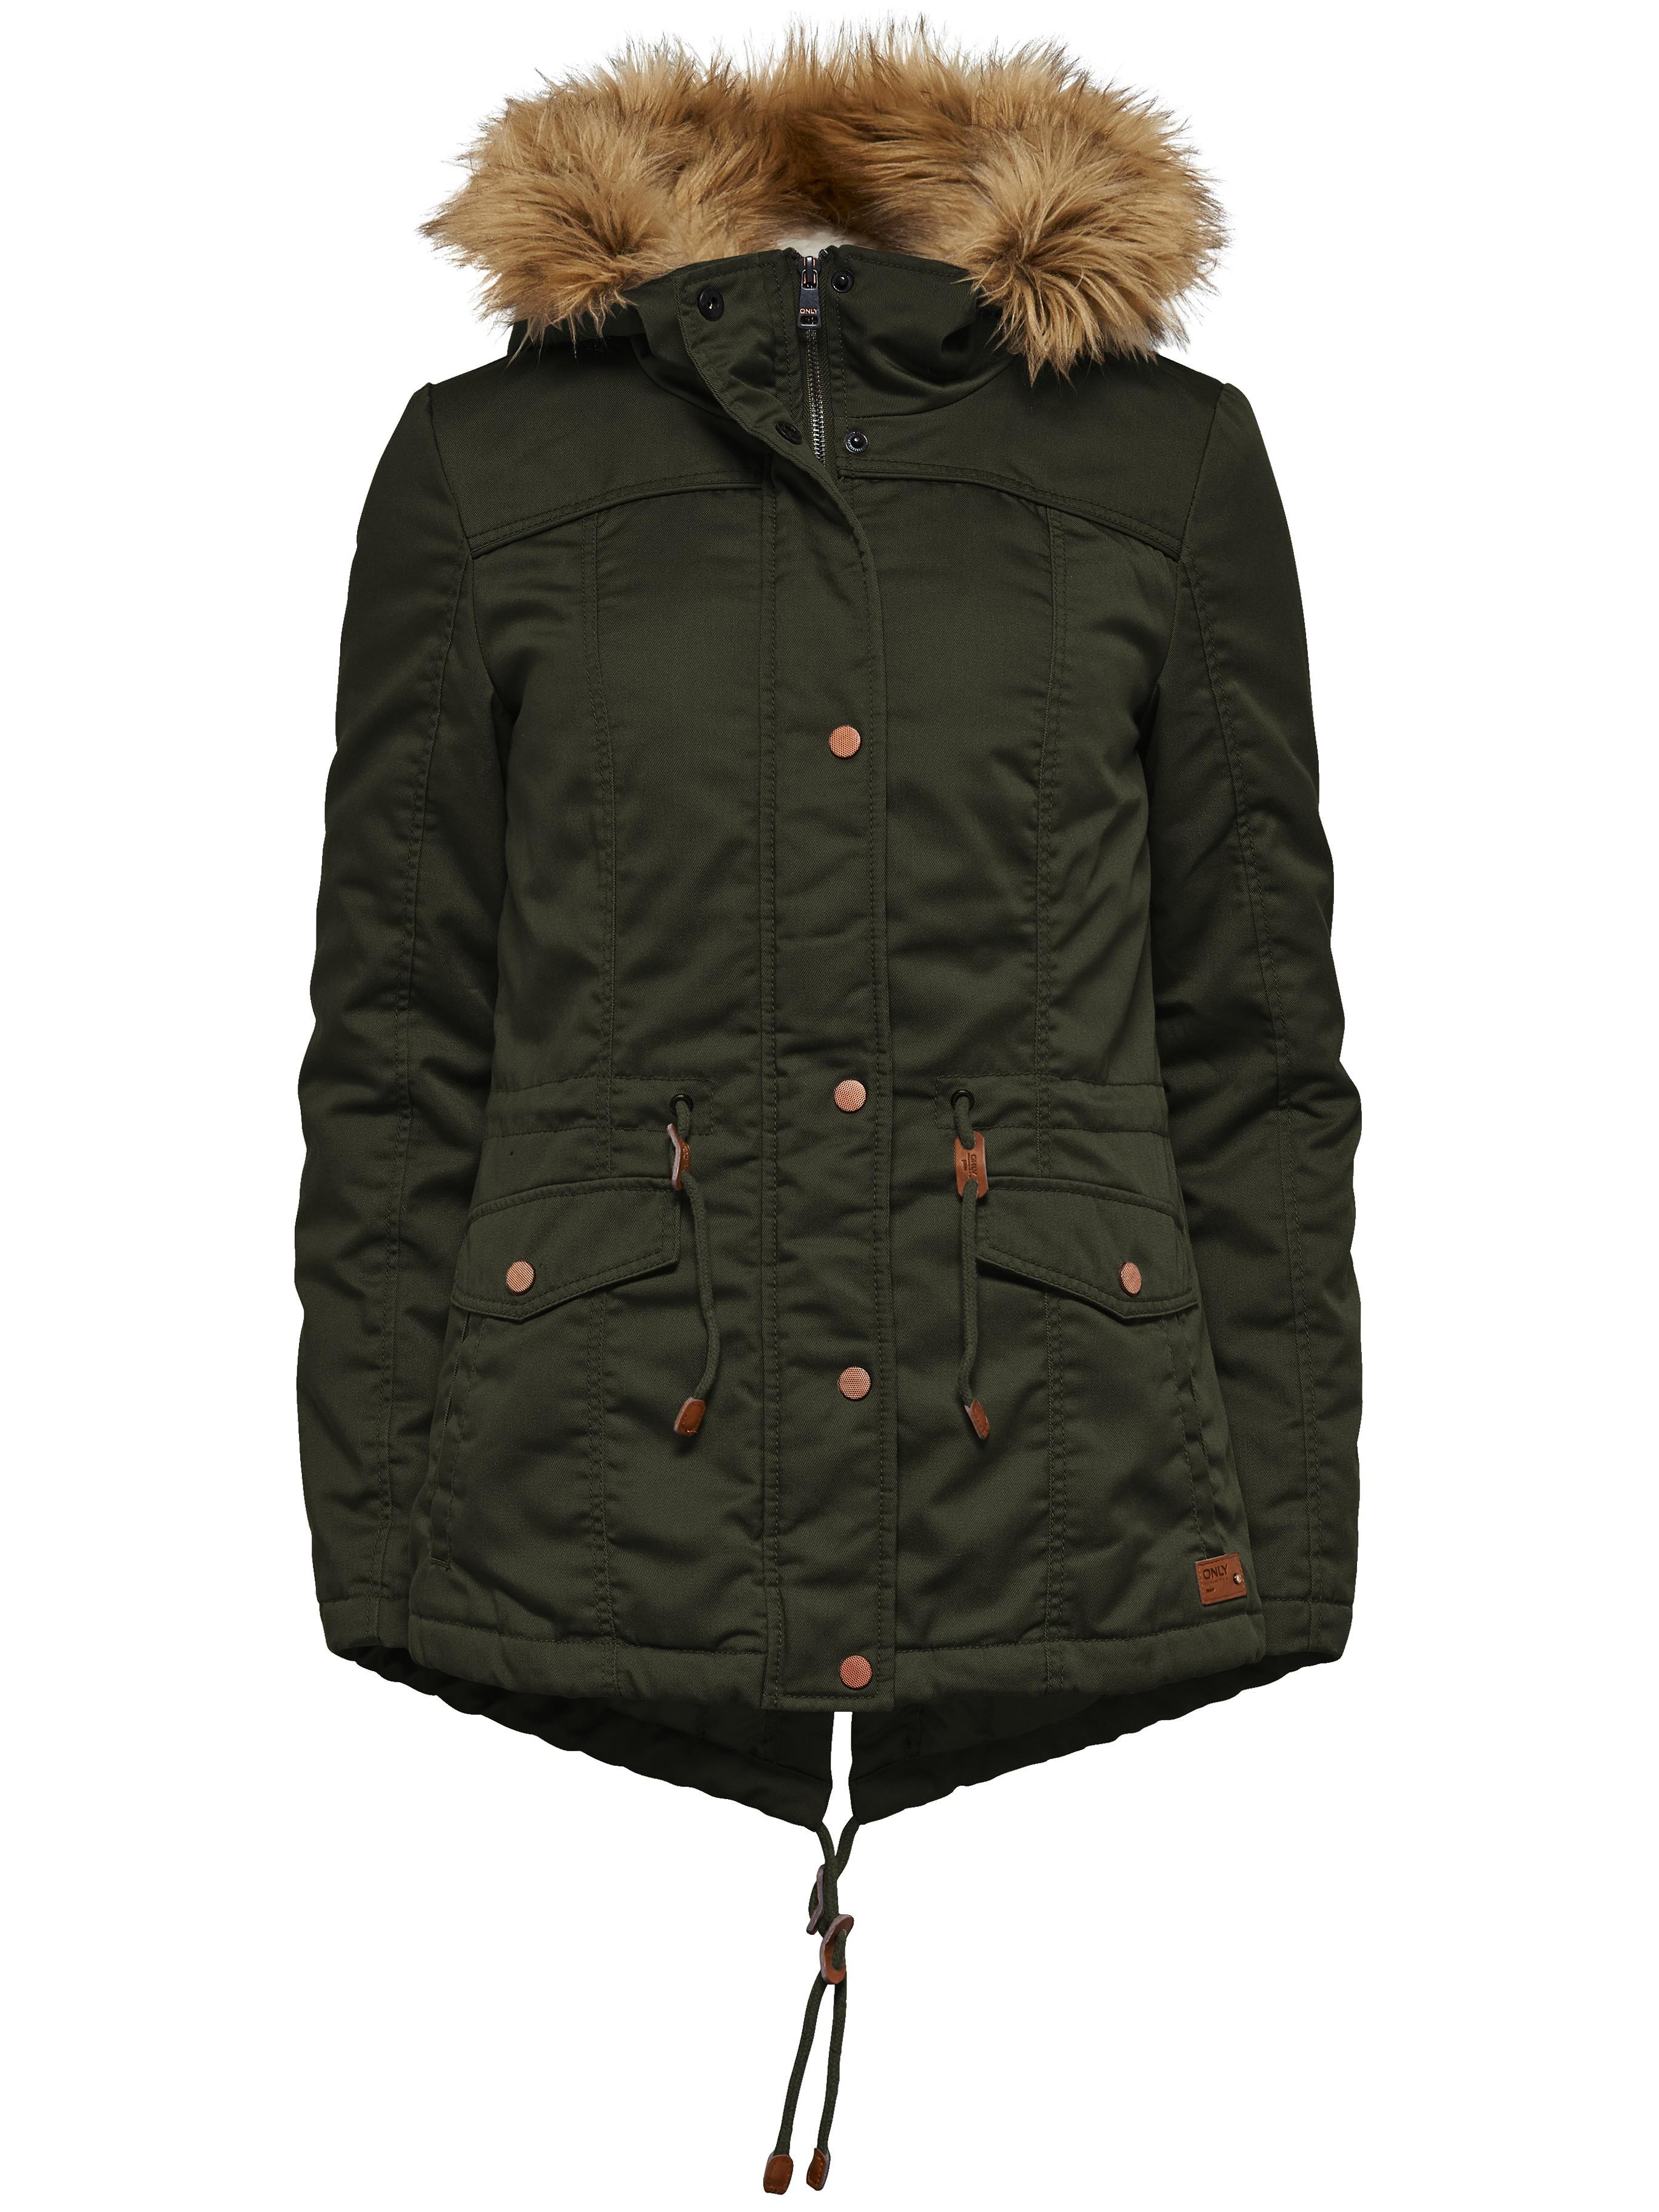 spätester Verkauf am besten kaufen große Auswahl an Farben ONLY Damen Winterjacke Jacke onlKATE SHORT CANVAS JACKET Parka khaki grün